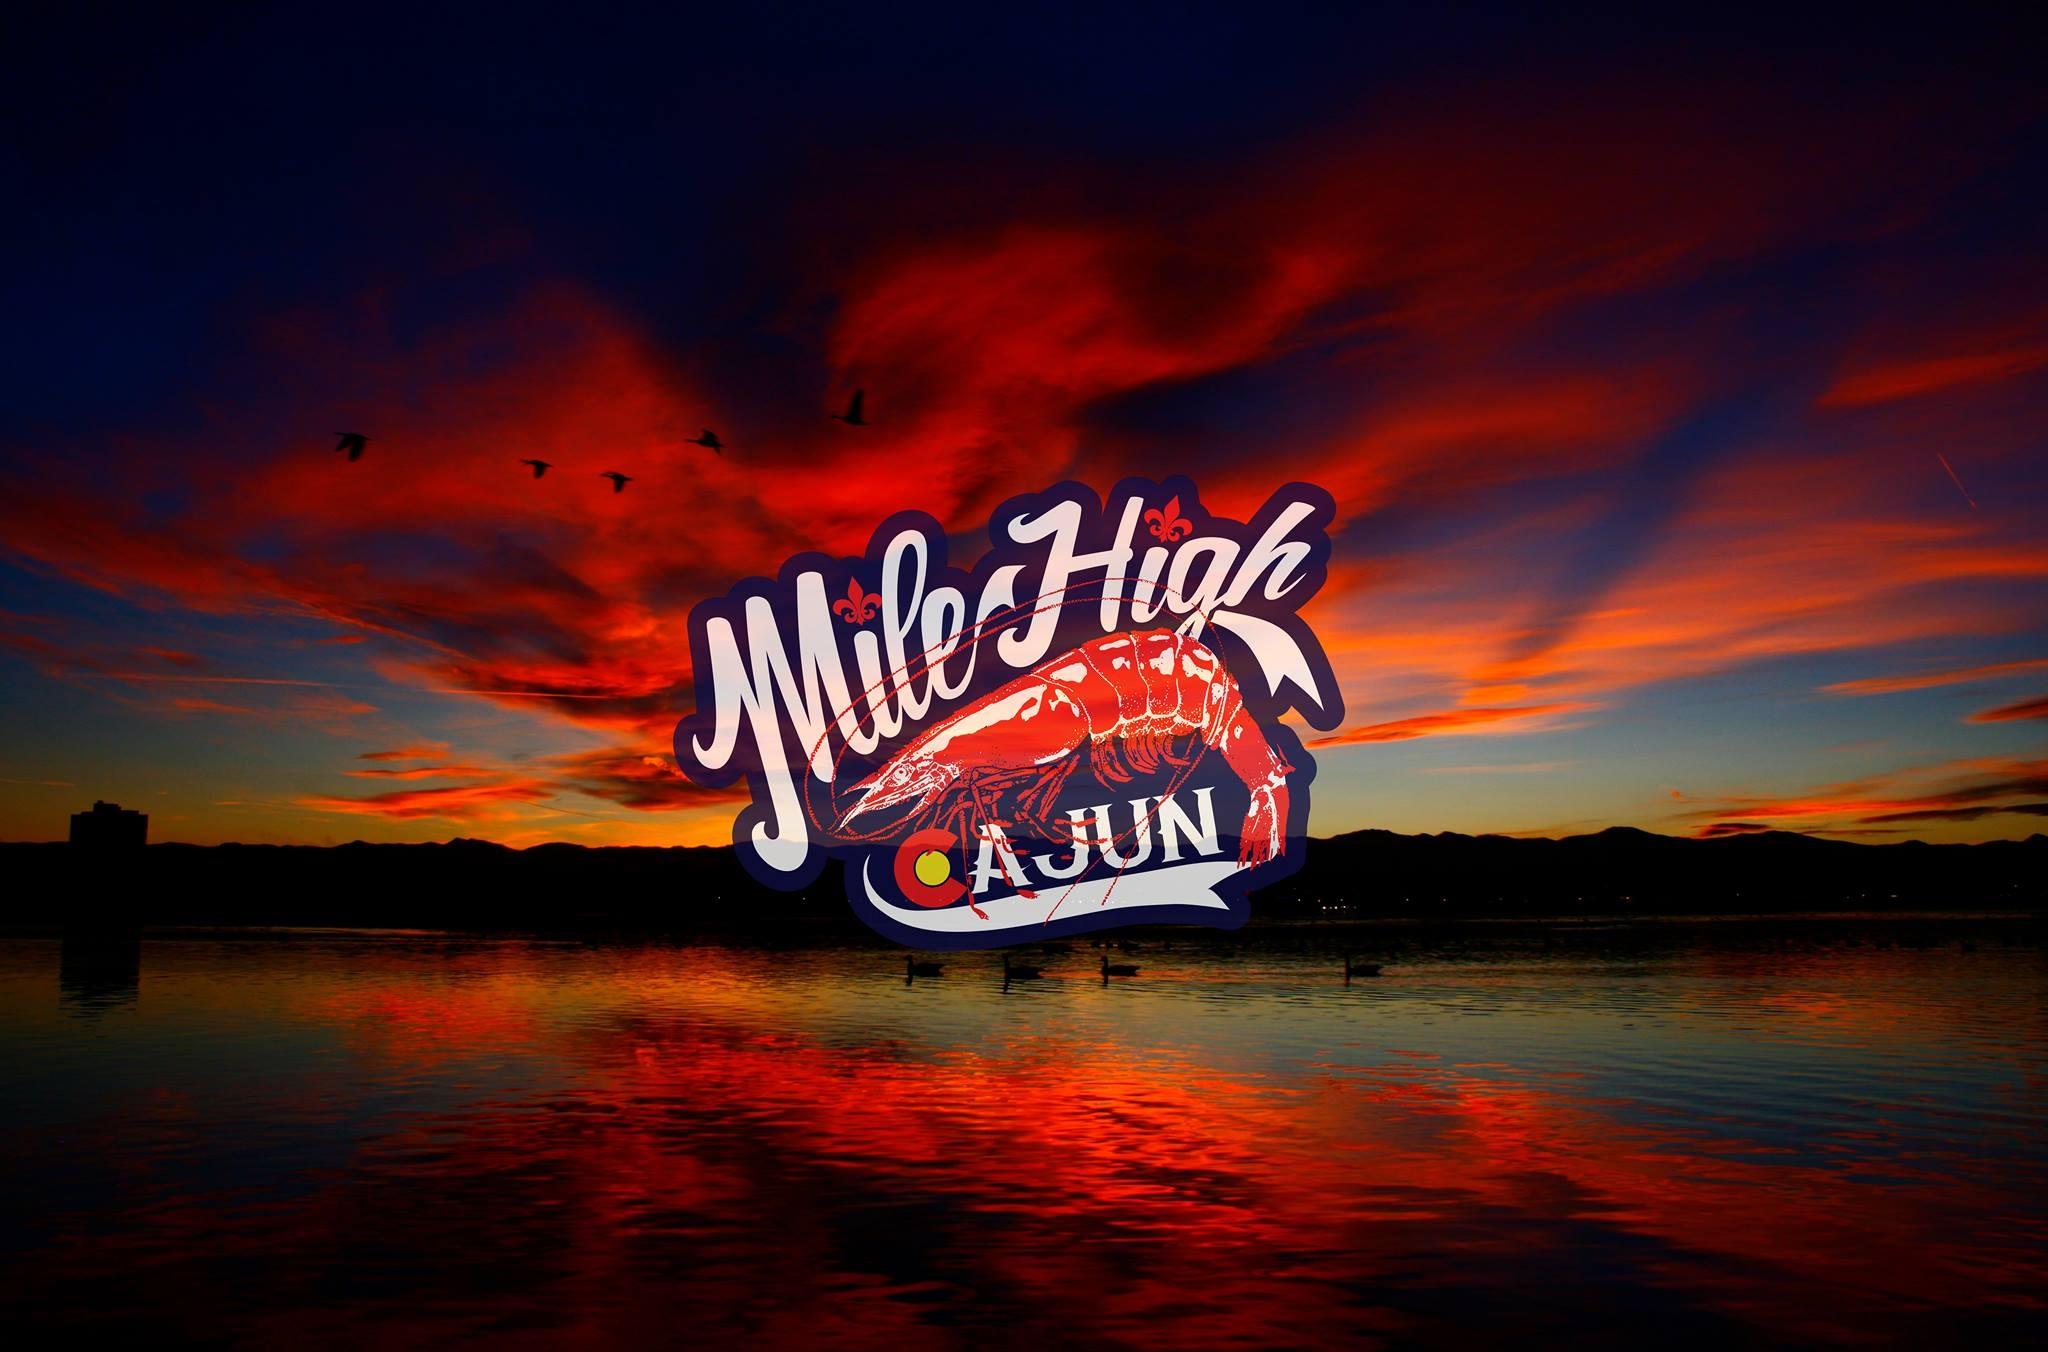 Mile High Cajun logo